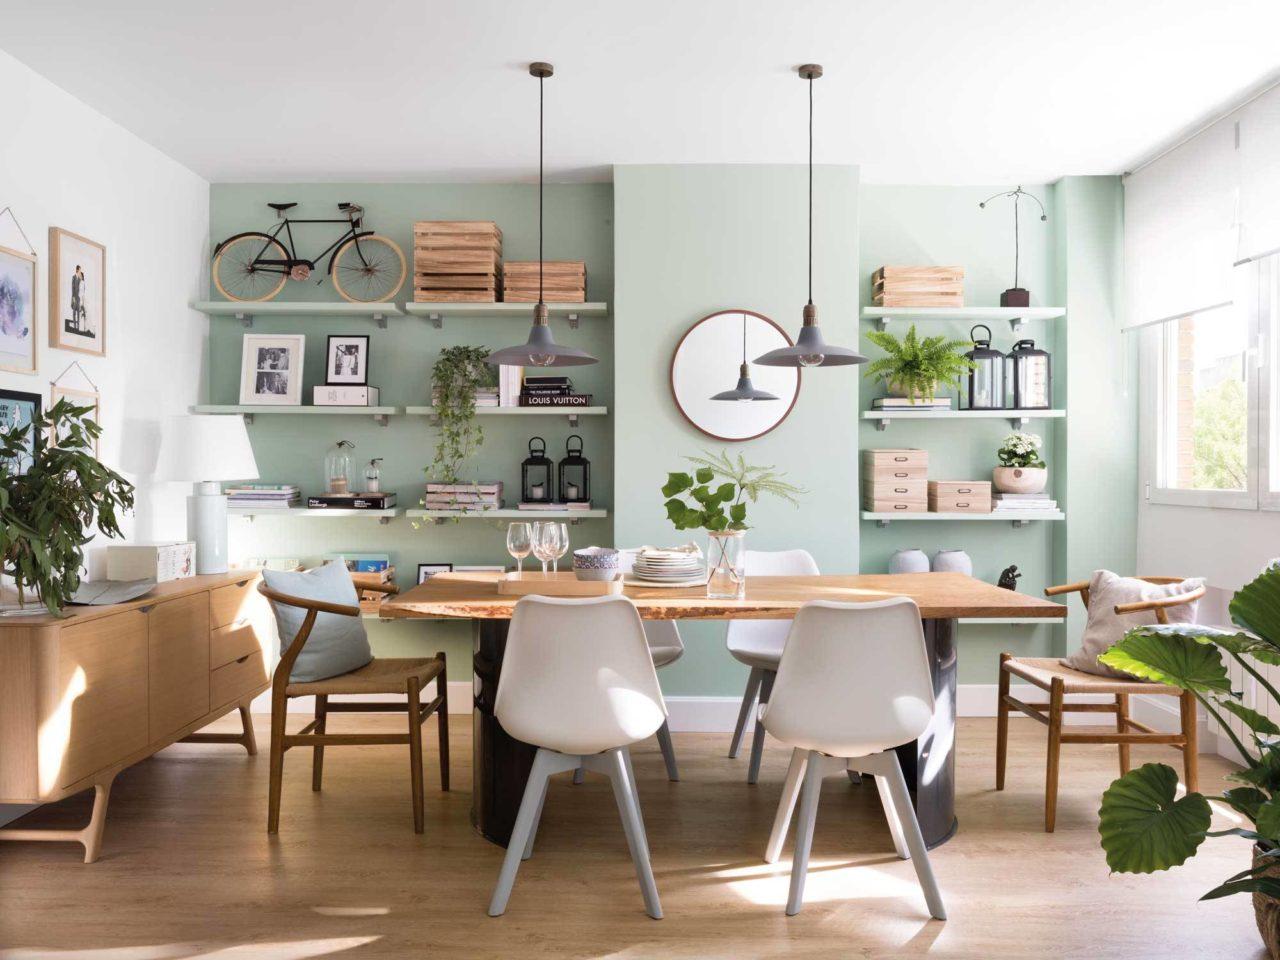 https://ekaenlinea.com/wp-content/uploads/2020/04/comedor-en-madera-con-pared-en-color-verde-y-estanteria-00510076_e3808bc3_2000x1500-1280x960.jpg